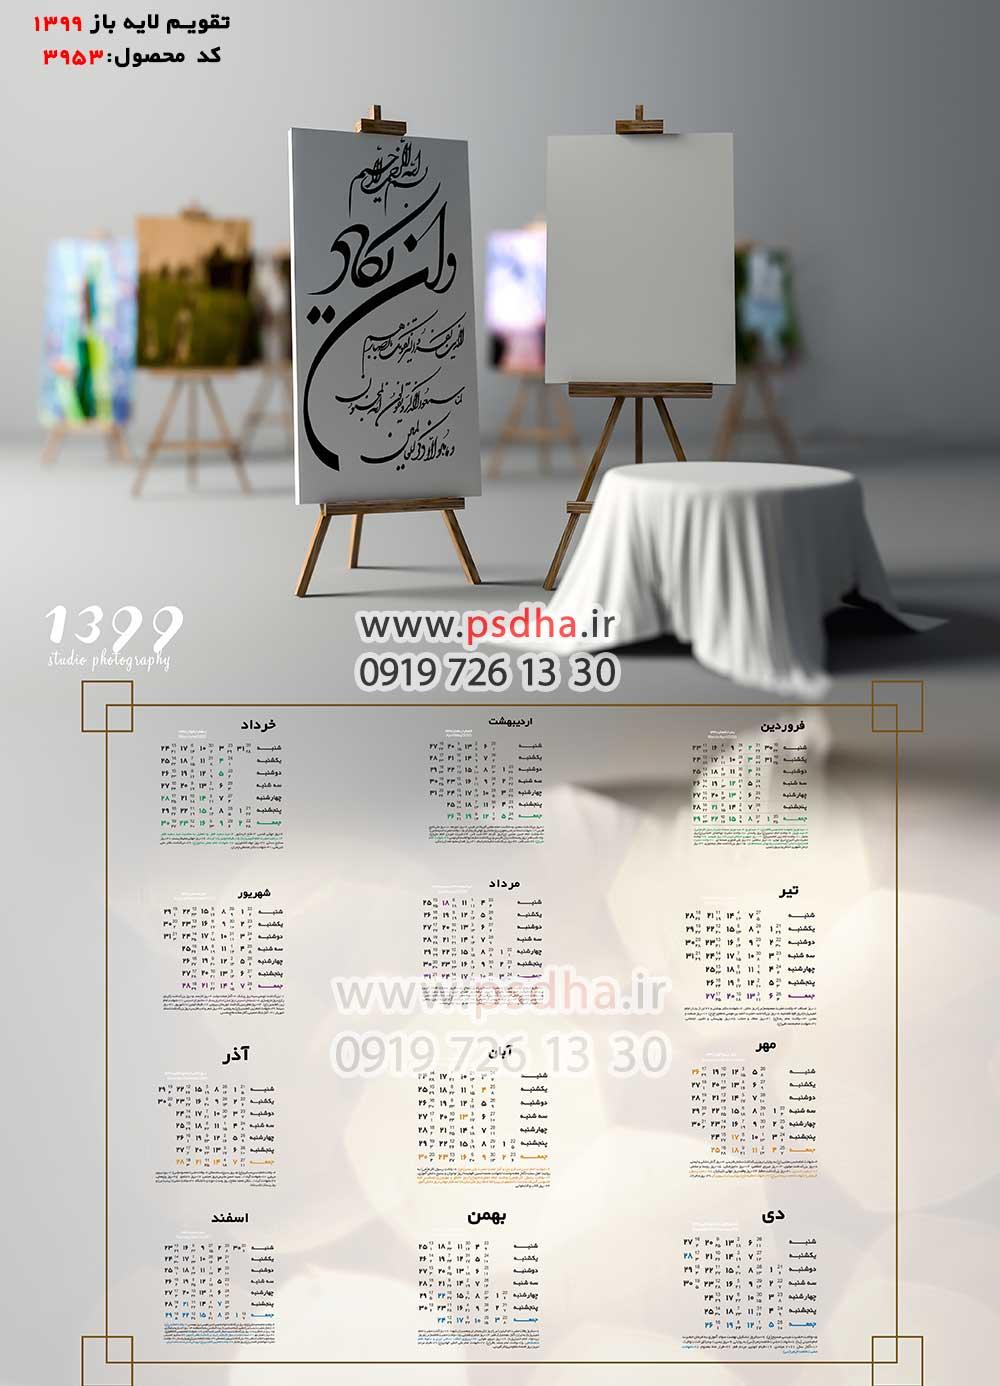 تقویم دیواری سال 1399 شمسی